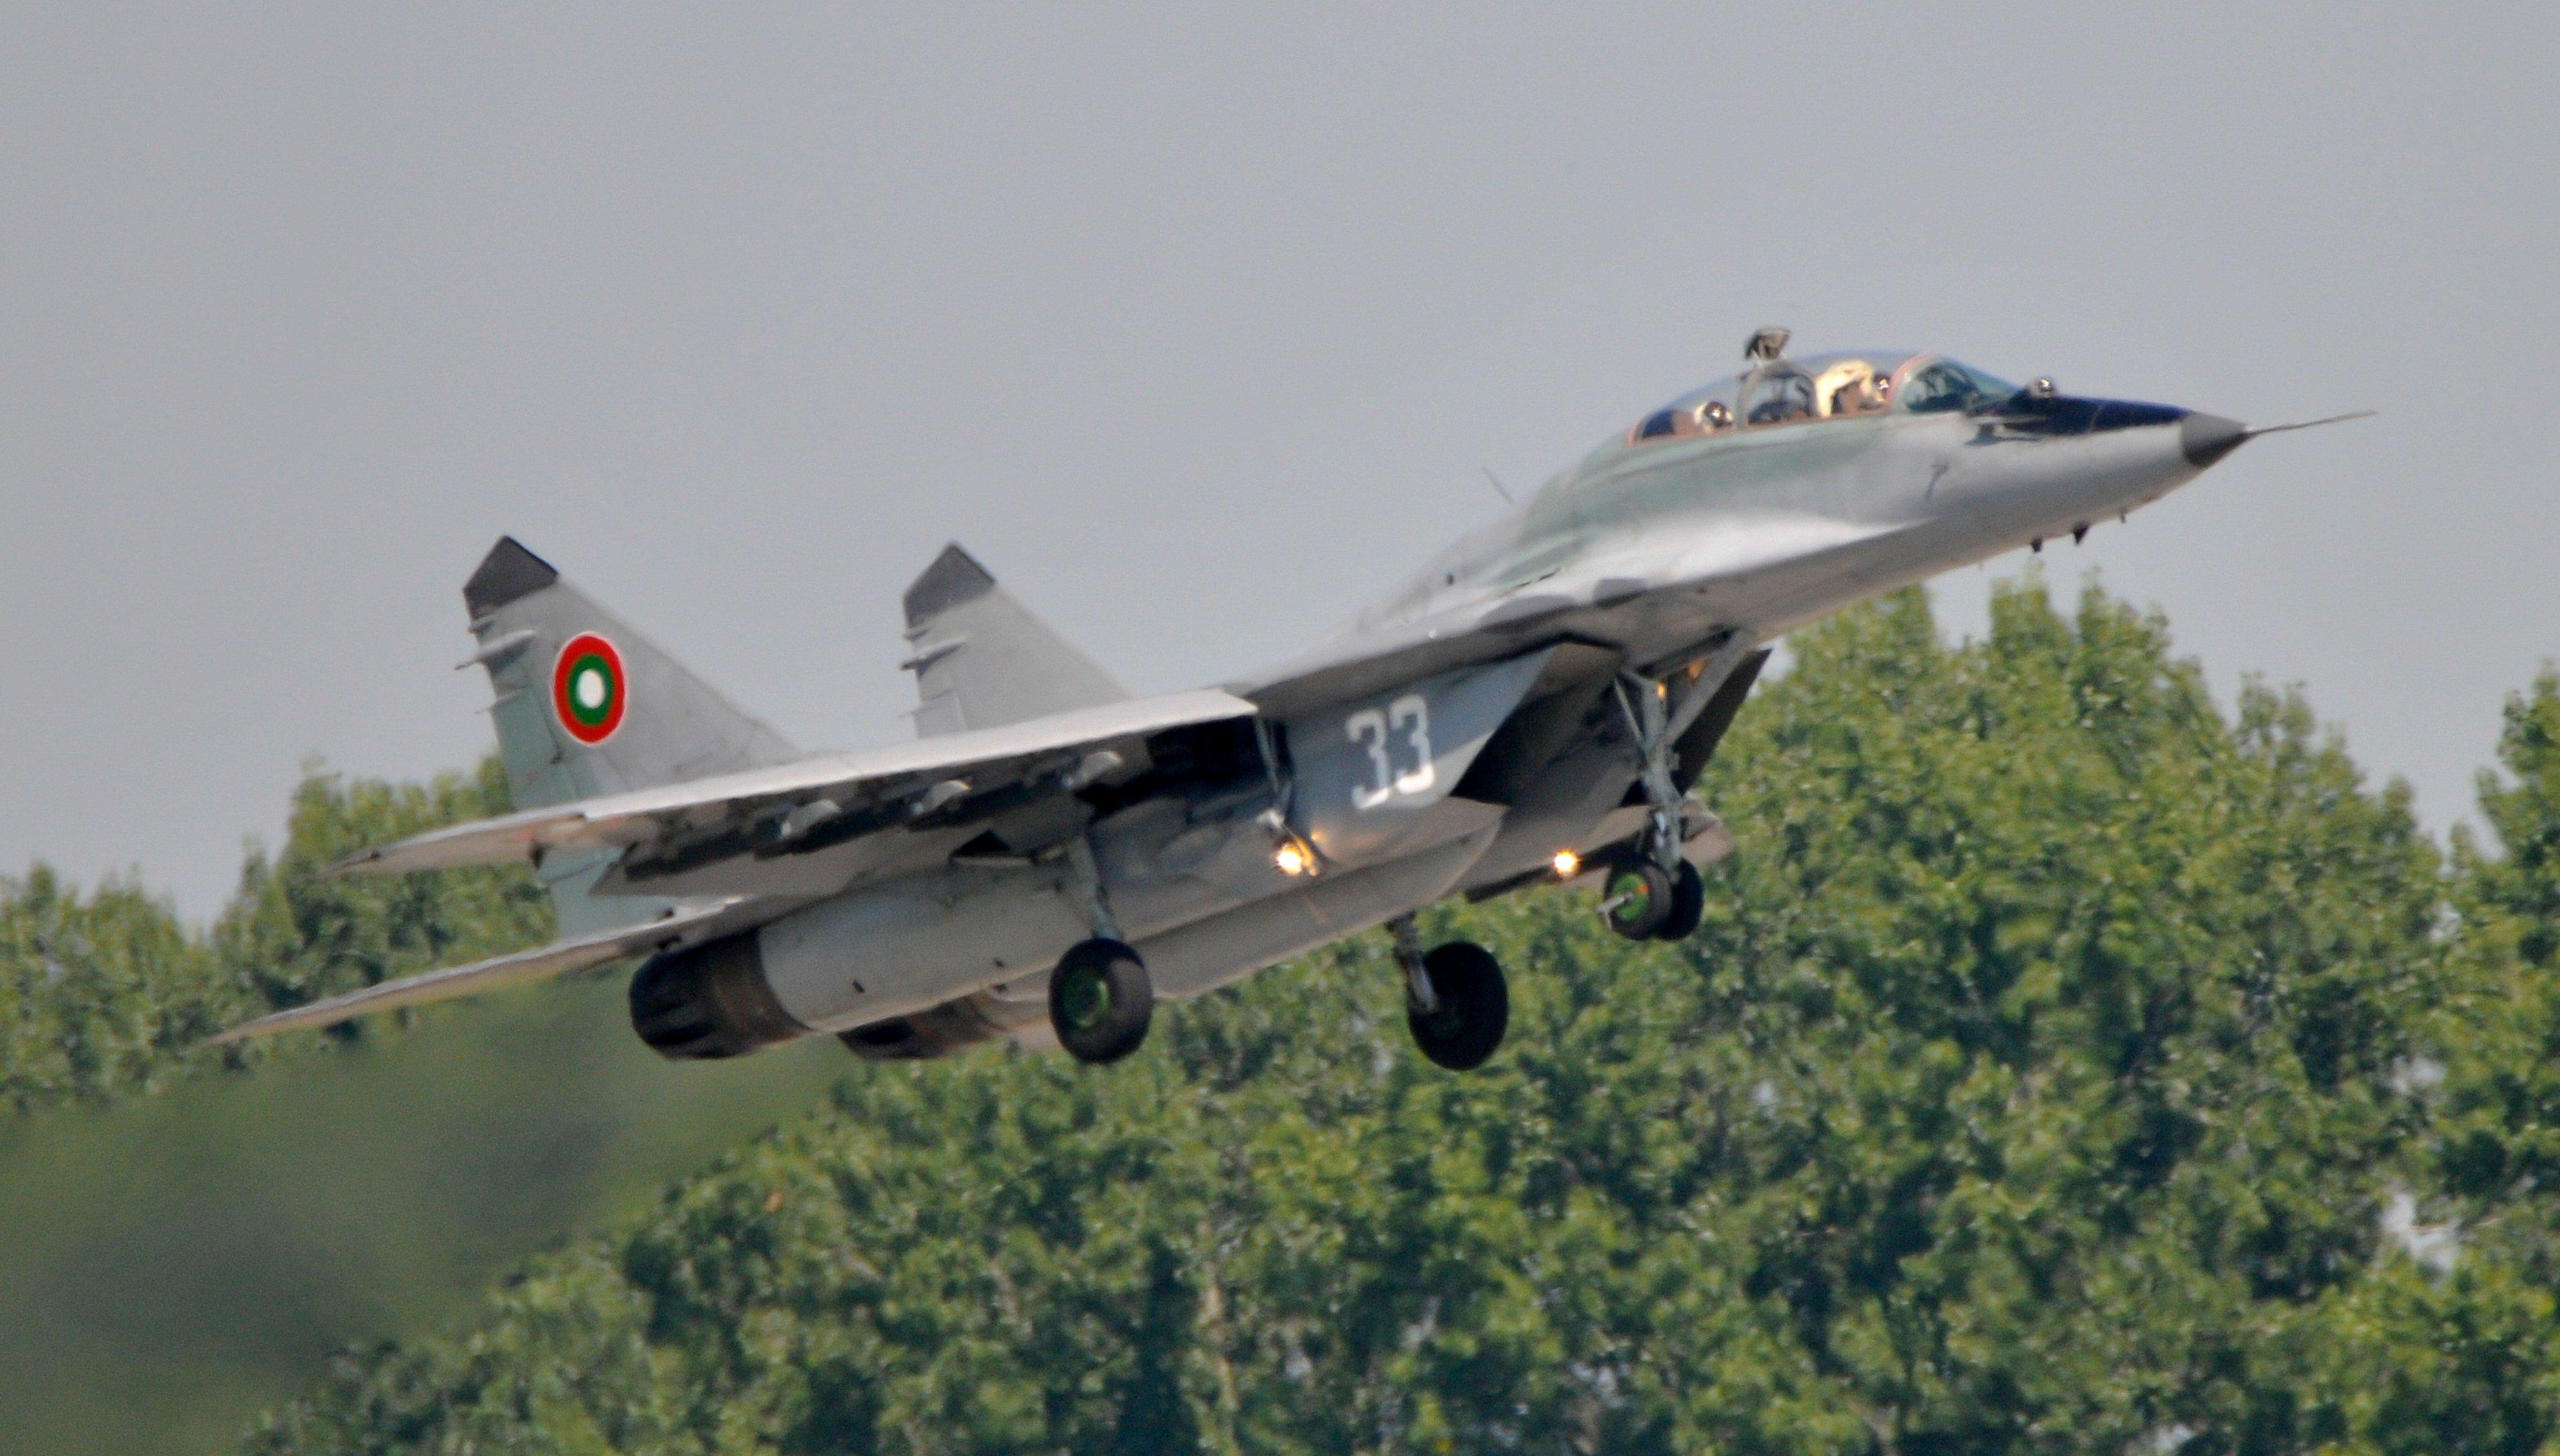 Bulgarian MiG-29 [US Air National Guard/Master Sgt Andrew J Moseley]